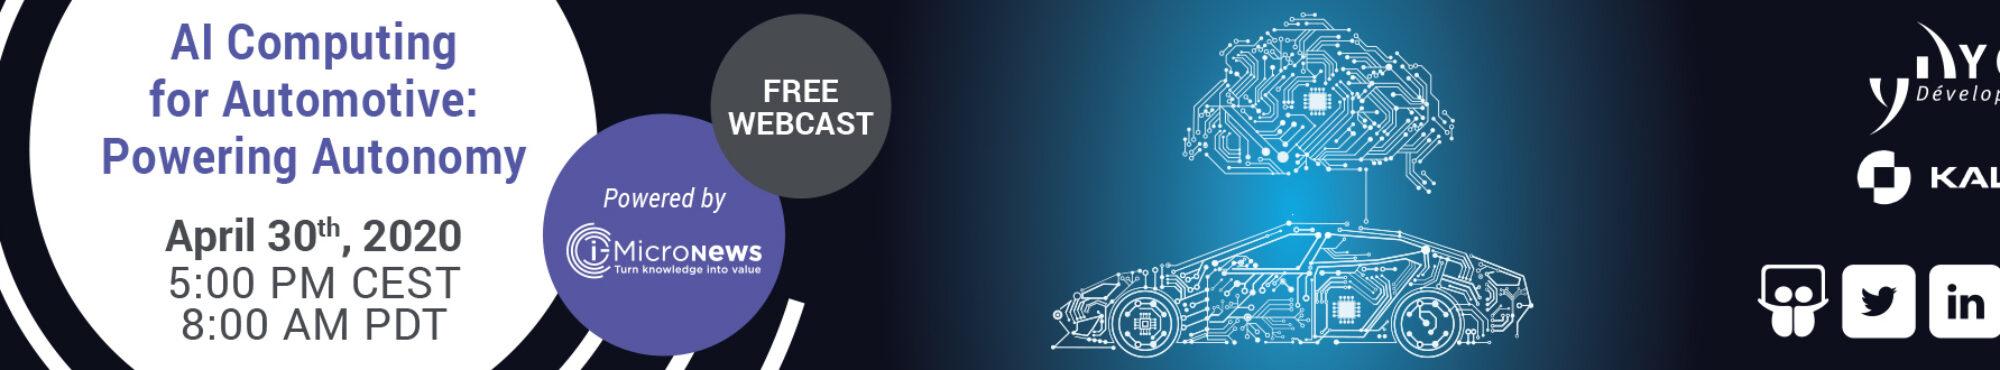 AI Computing for Automotive Powering Autonomy 2000x370